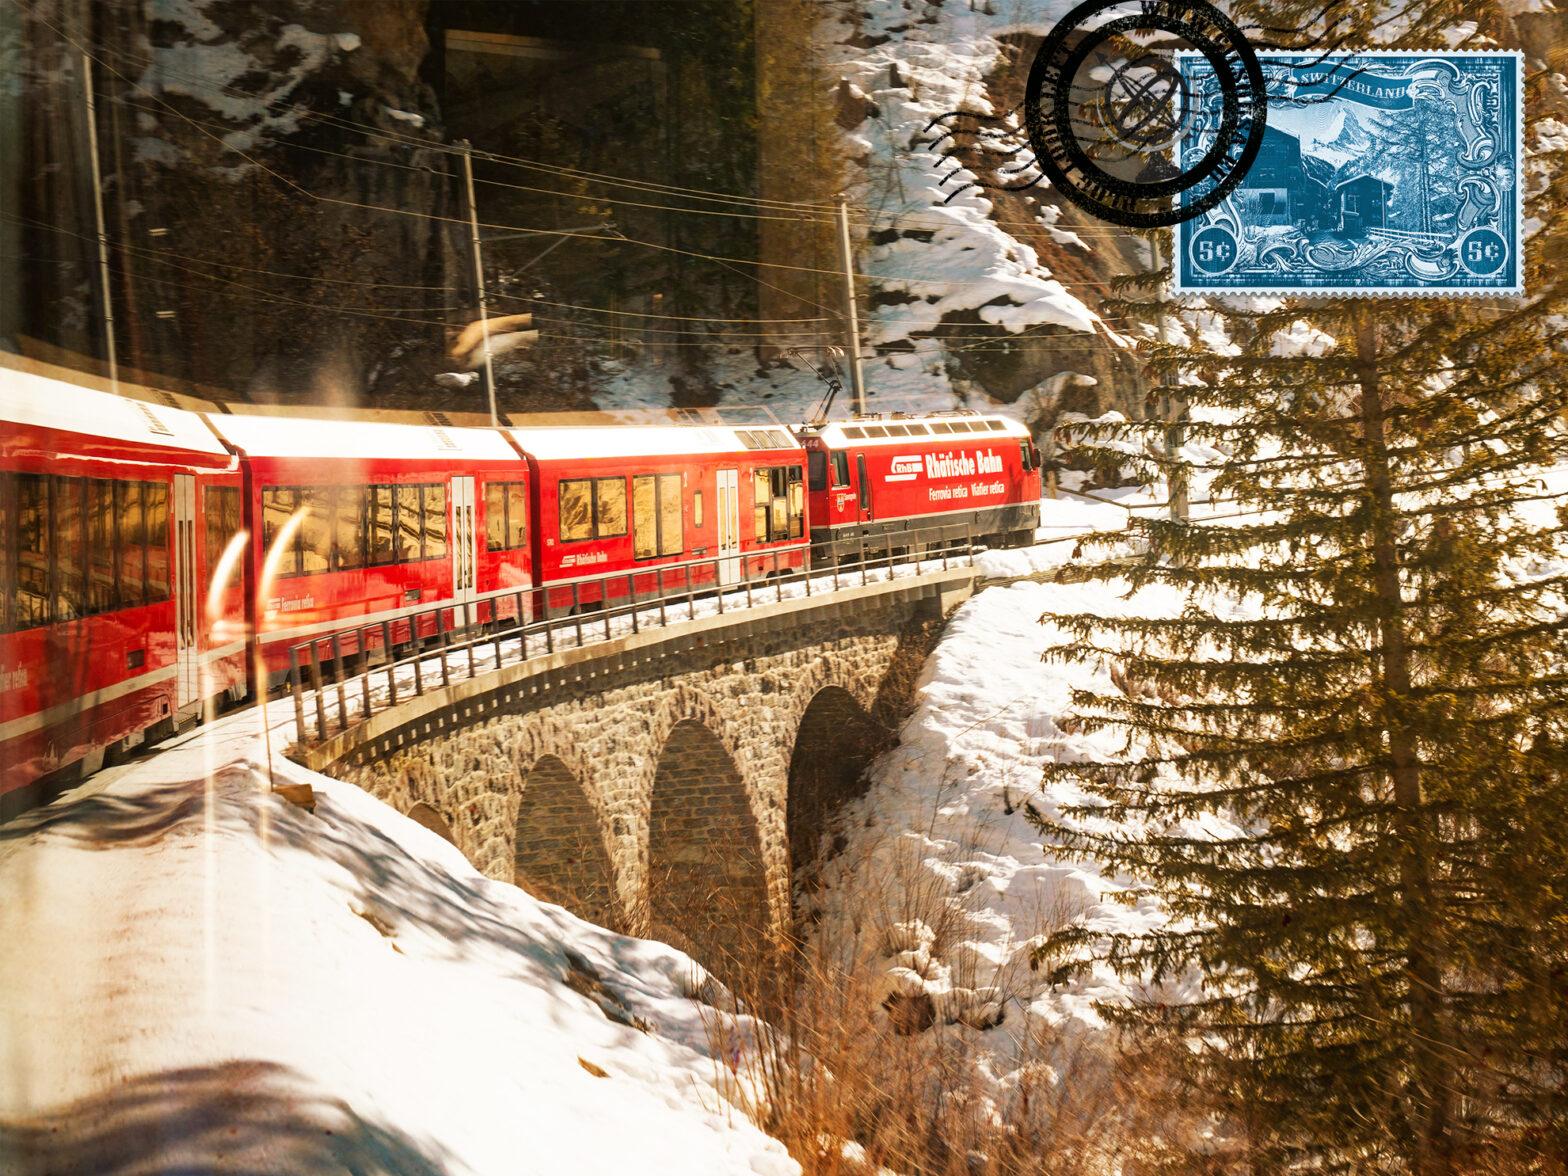 Explore the Glacier Express from St. Moritz to Zermatt